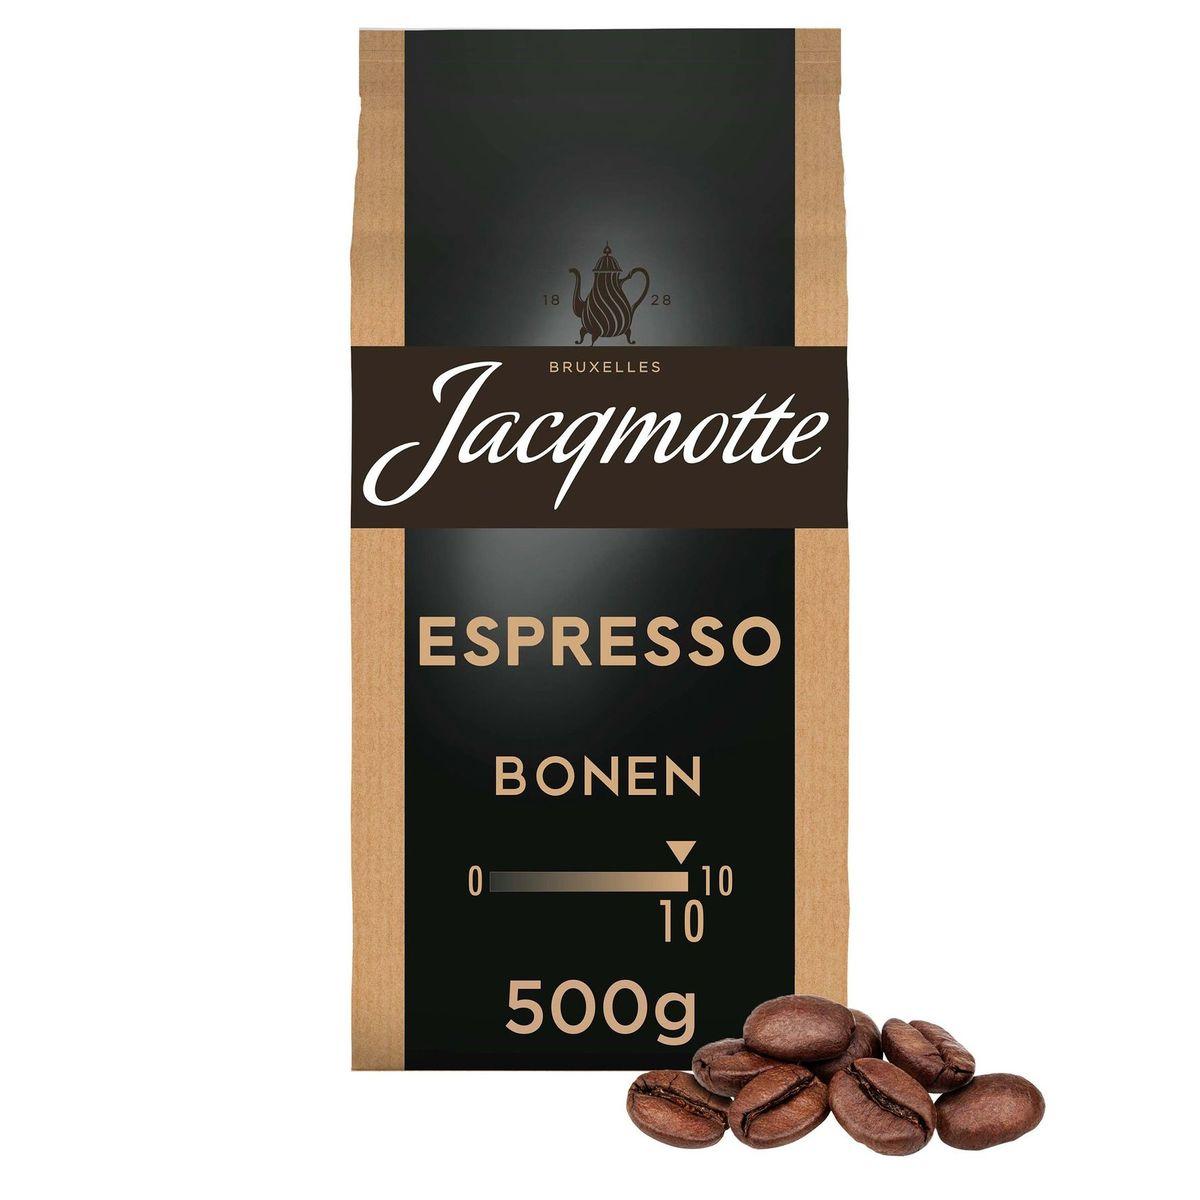 Jacqmotte Café Grains Espresso 500 g